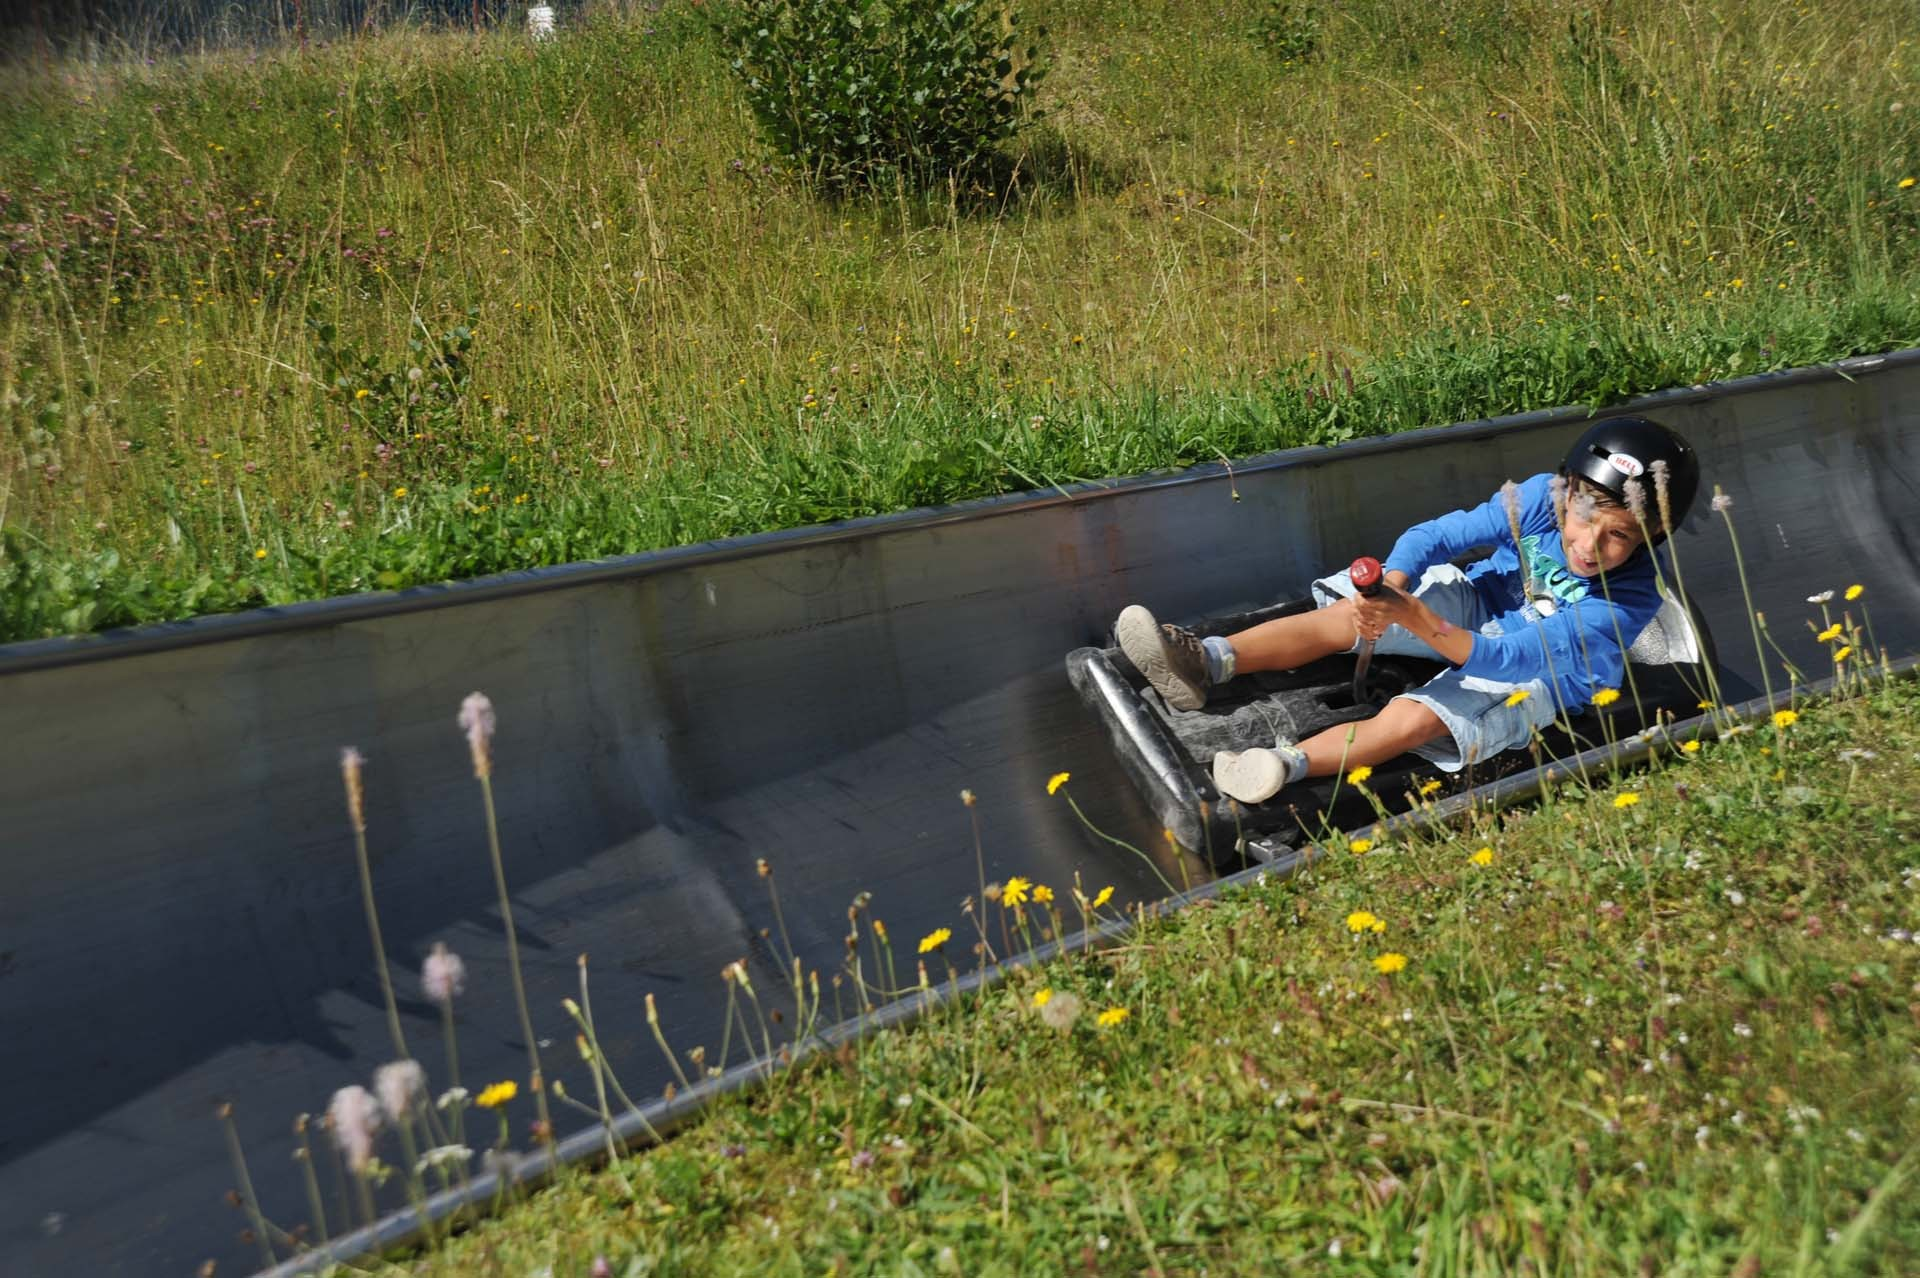 Downhill fun in summer